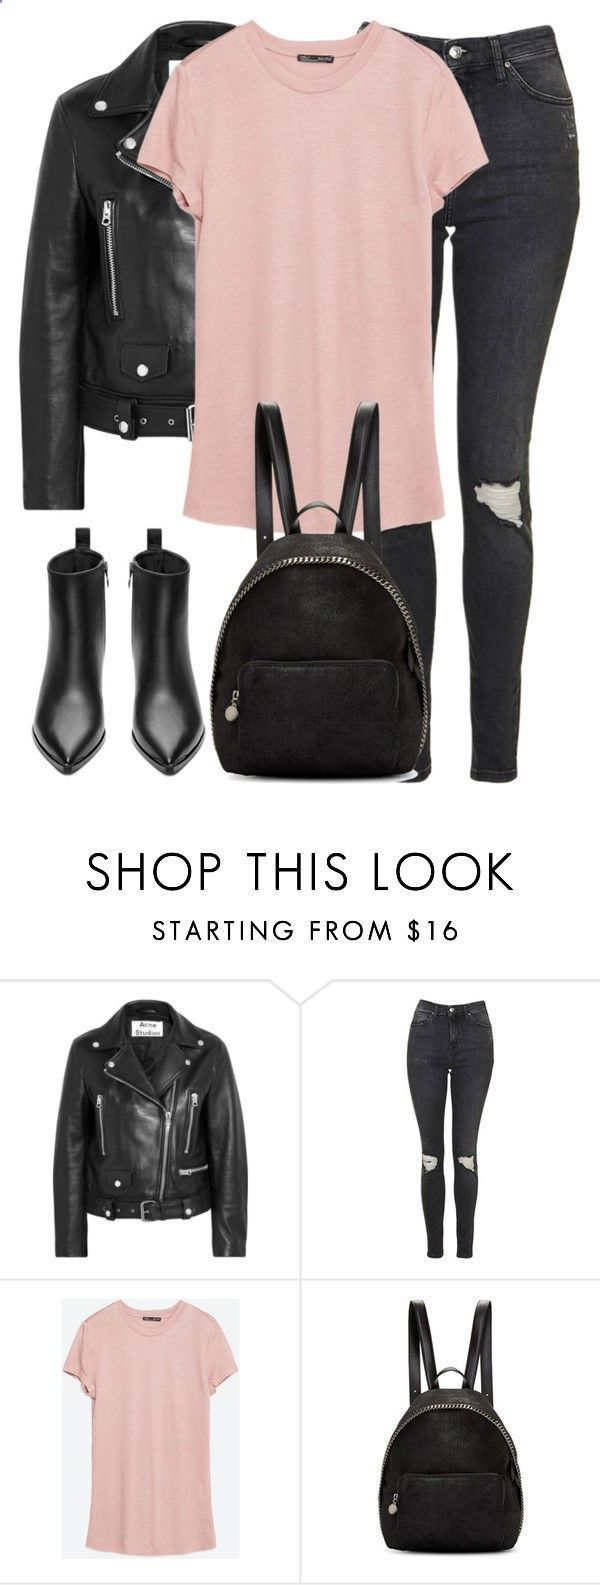 schwarze Hose + rosa Shirt + schwarzer Blazer + schwarze Schuhe